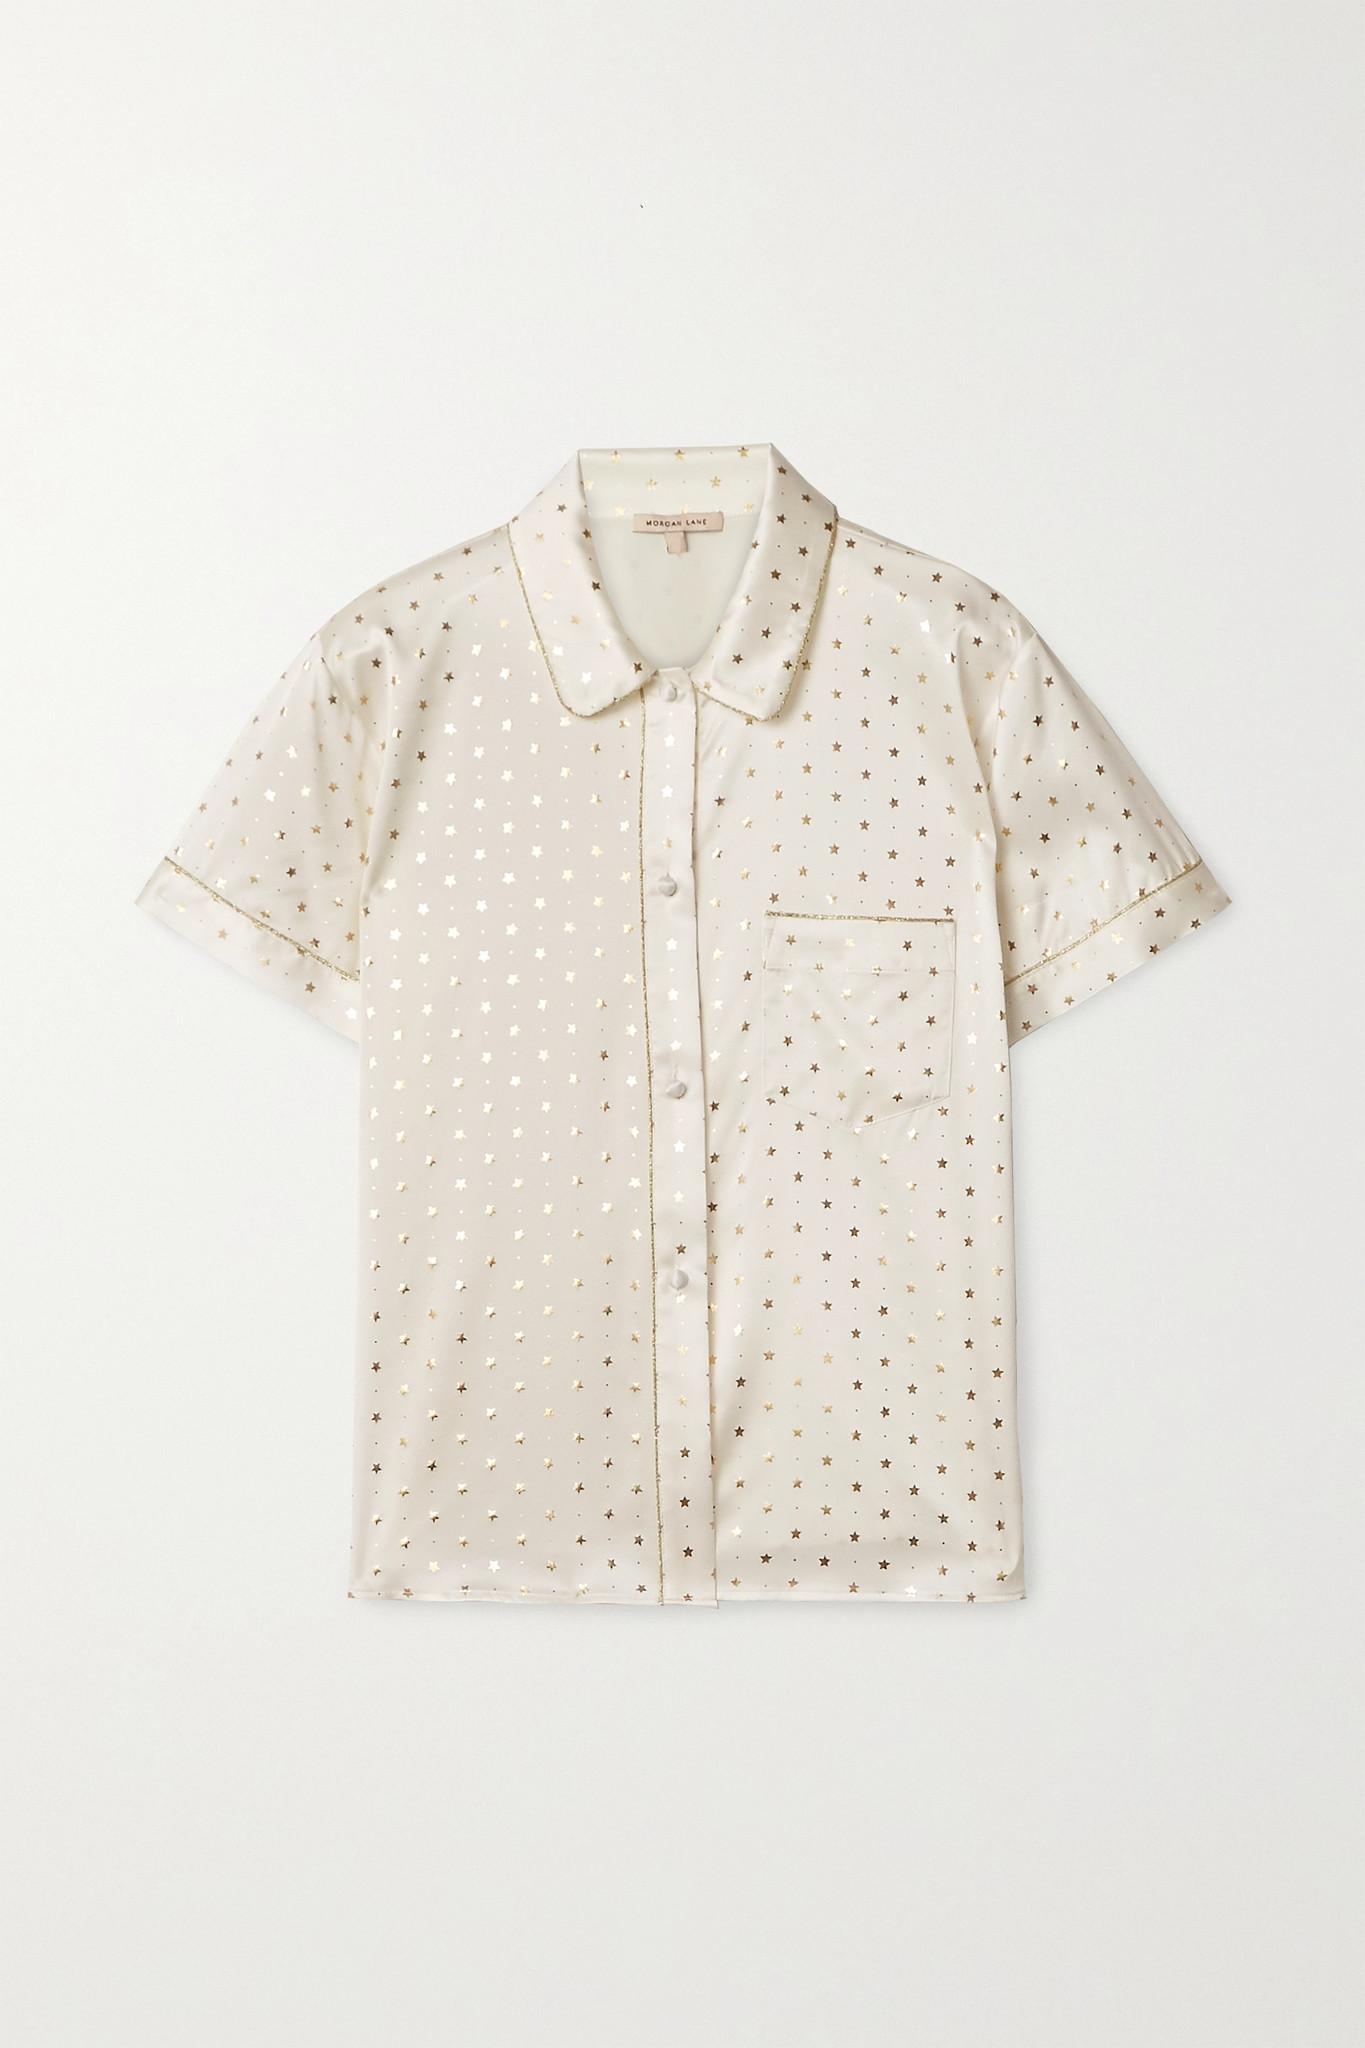 MORGAN LANE - Tami 金属感边饰印花真丝混纺缎布衬衫式睡衣 - 象牙色 - small